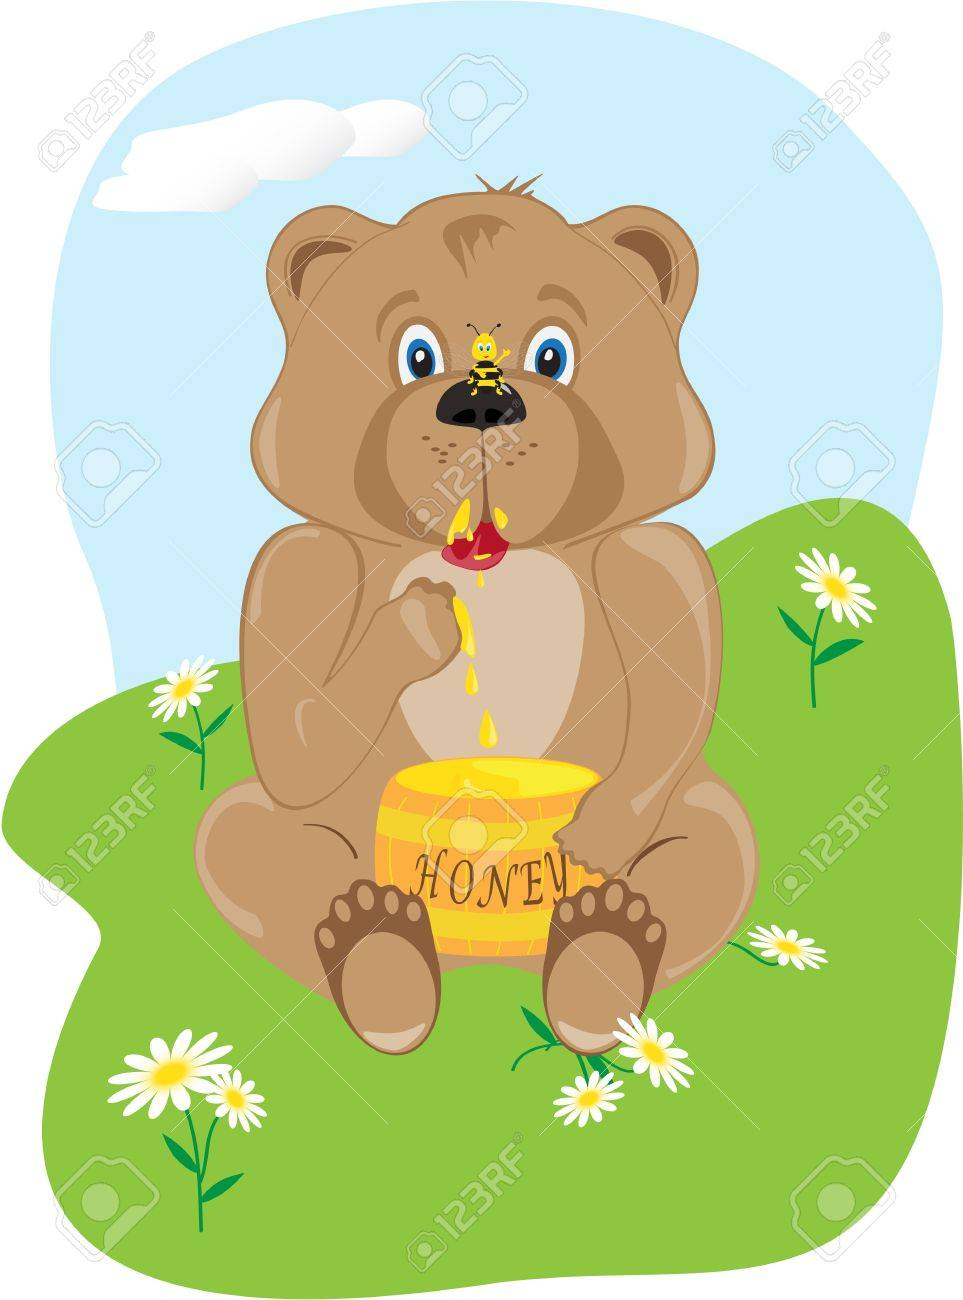 The bear cub eats honey from a keg Stock Vector - 9055812